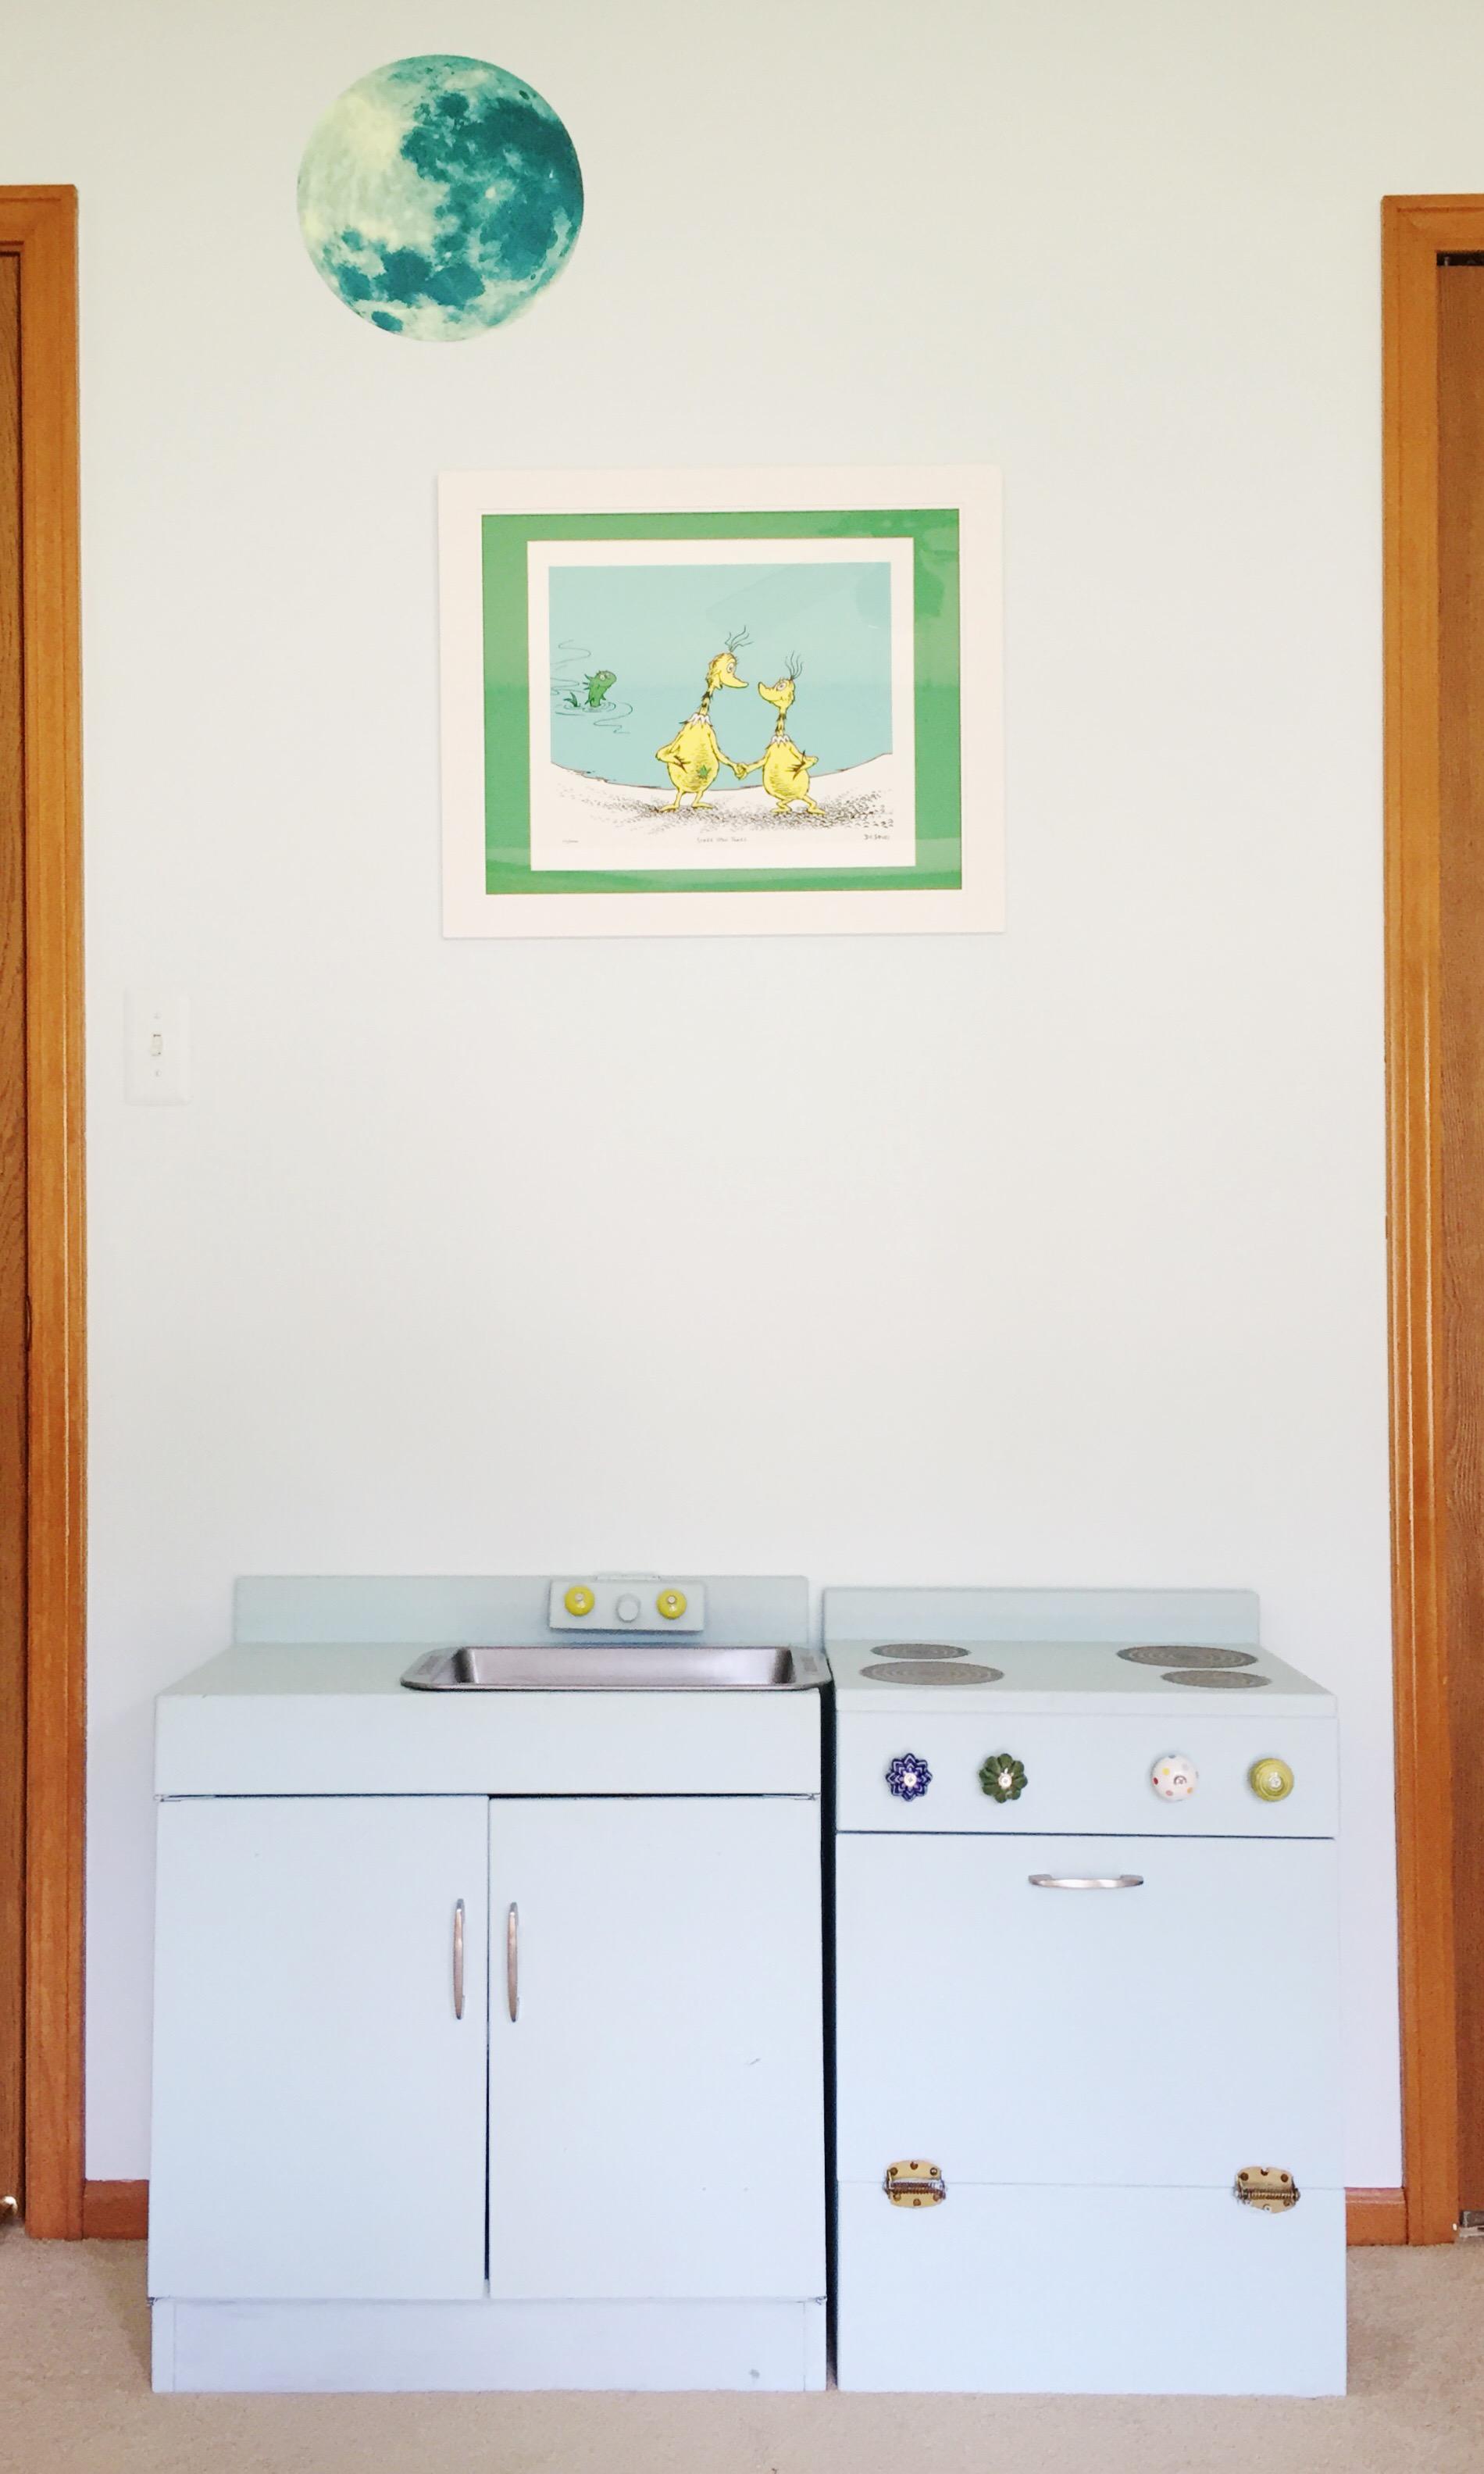 diy upcycled wood play kitchen.jpg